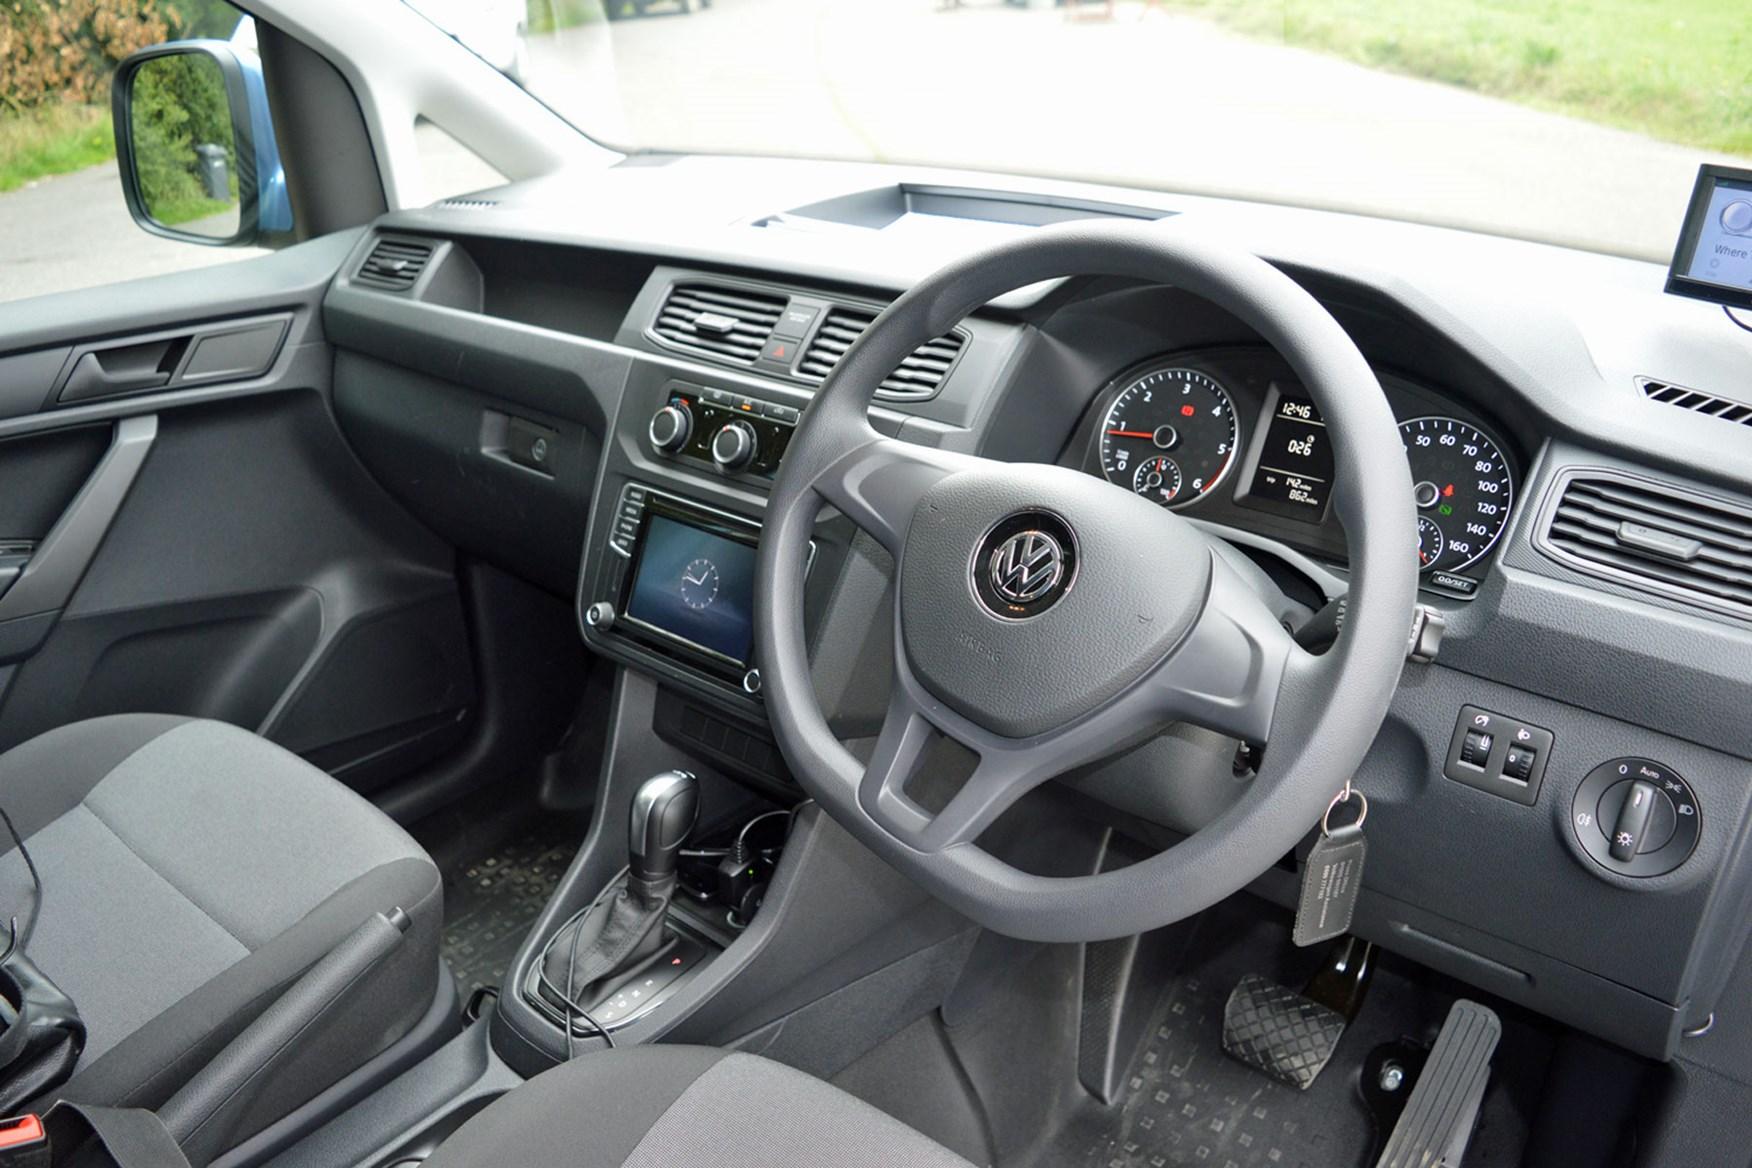 VW Caddy 1.6-litre TDI 102 DSG review - cab interior, 2015